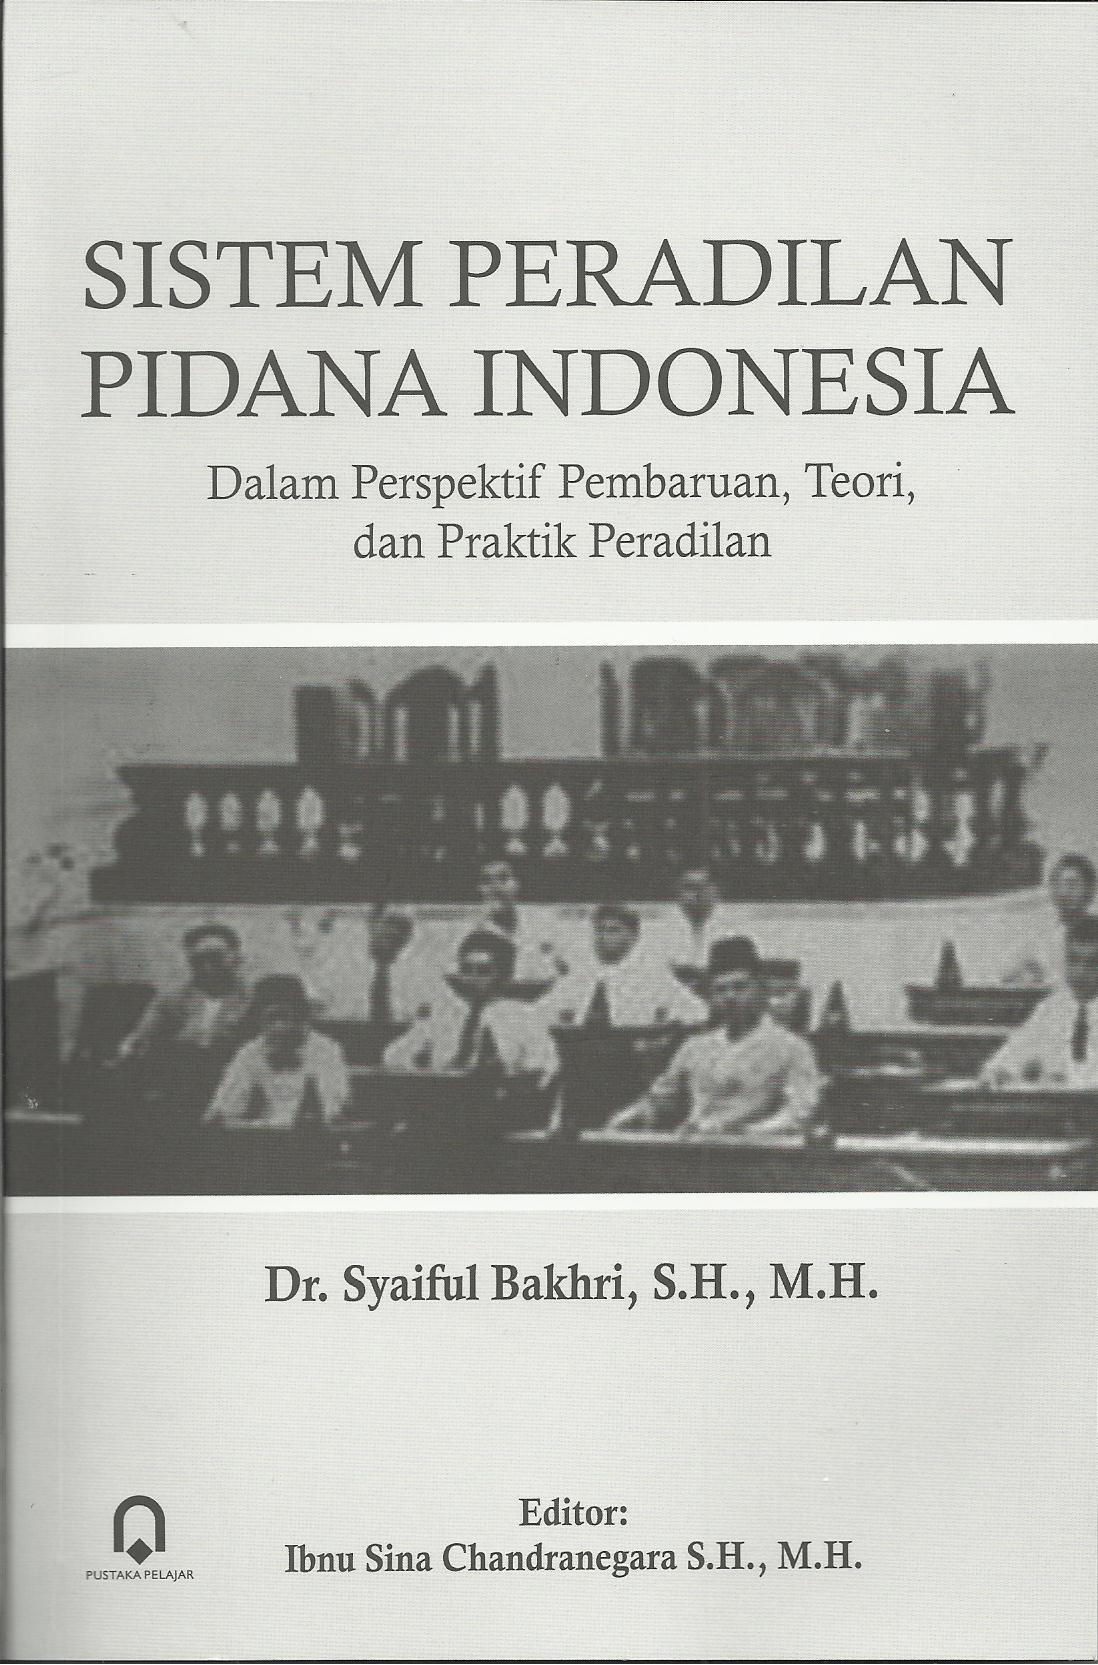 SISTEM PERADILAN PIDANA INDONESIA